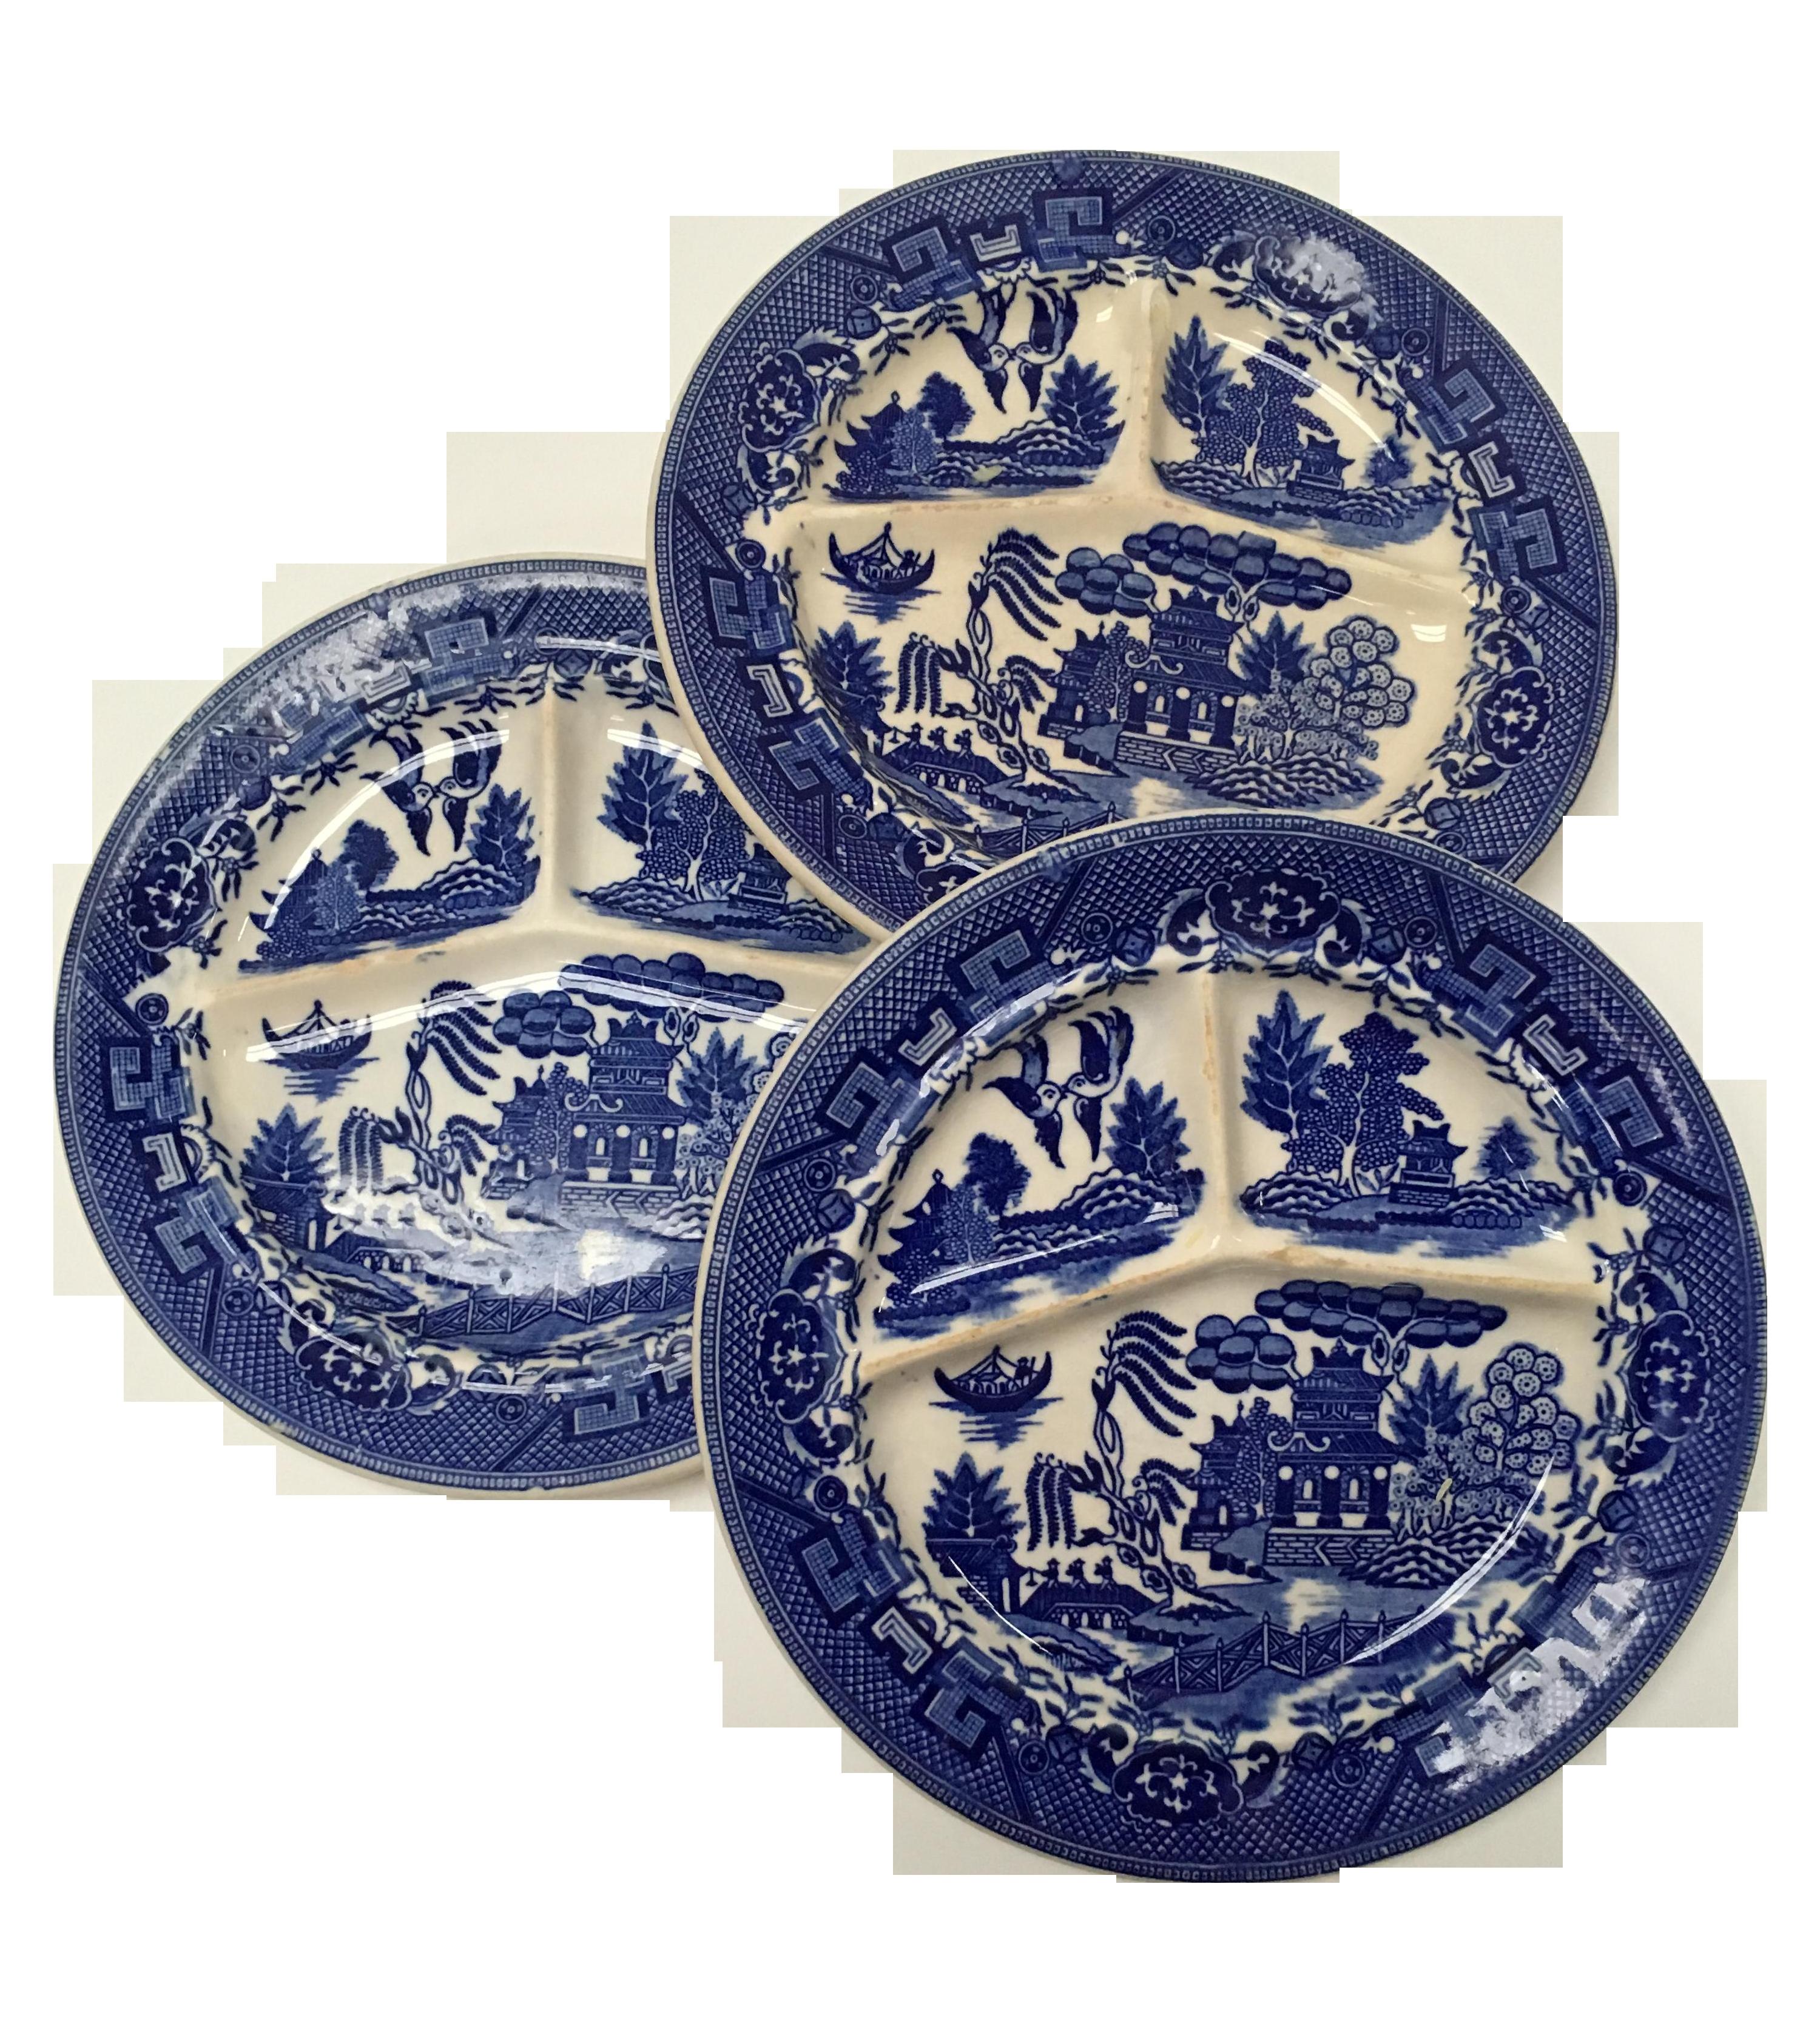 Antique Moriyama Blue Willow Plates - Set of 3  sc 1 st  Chairish & Antique Moriyama Blue Willow Plates - Set of 3 | Chairish